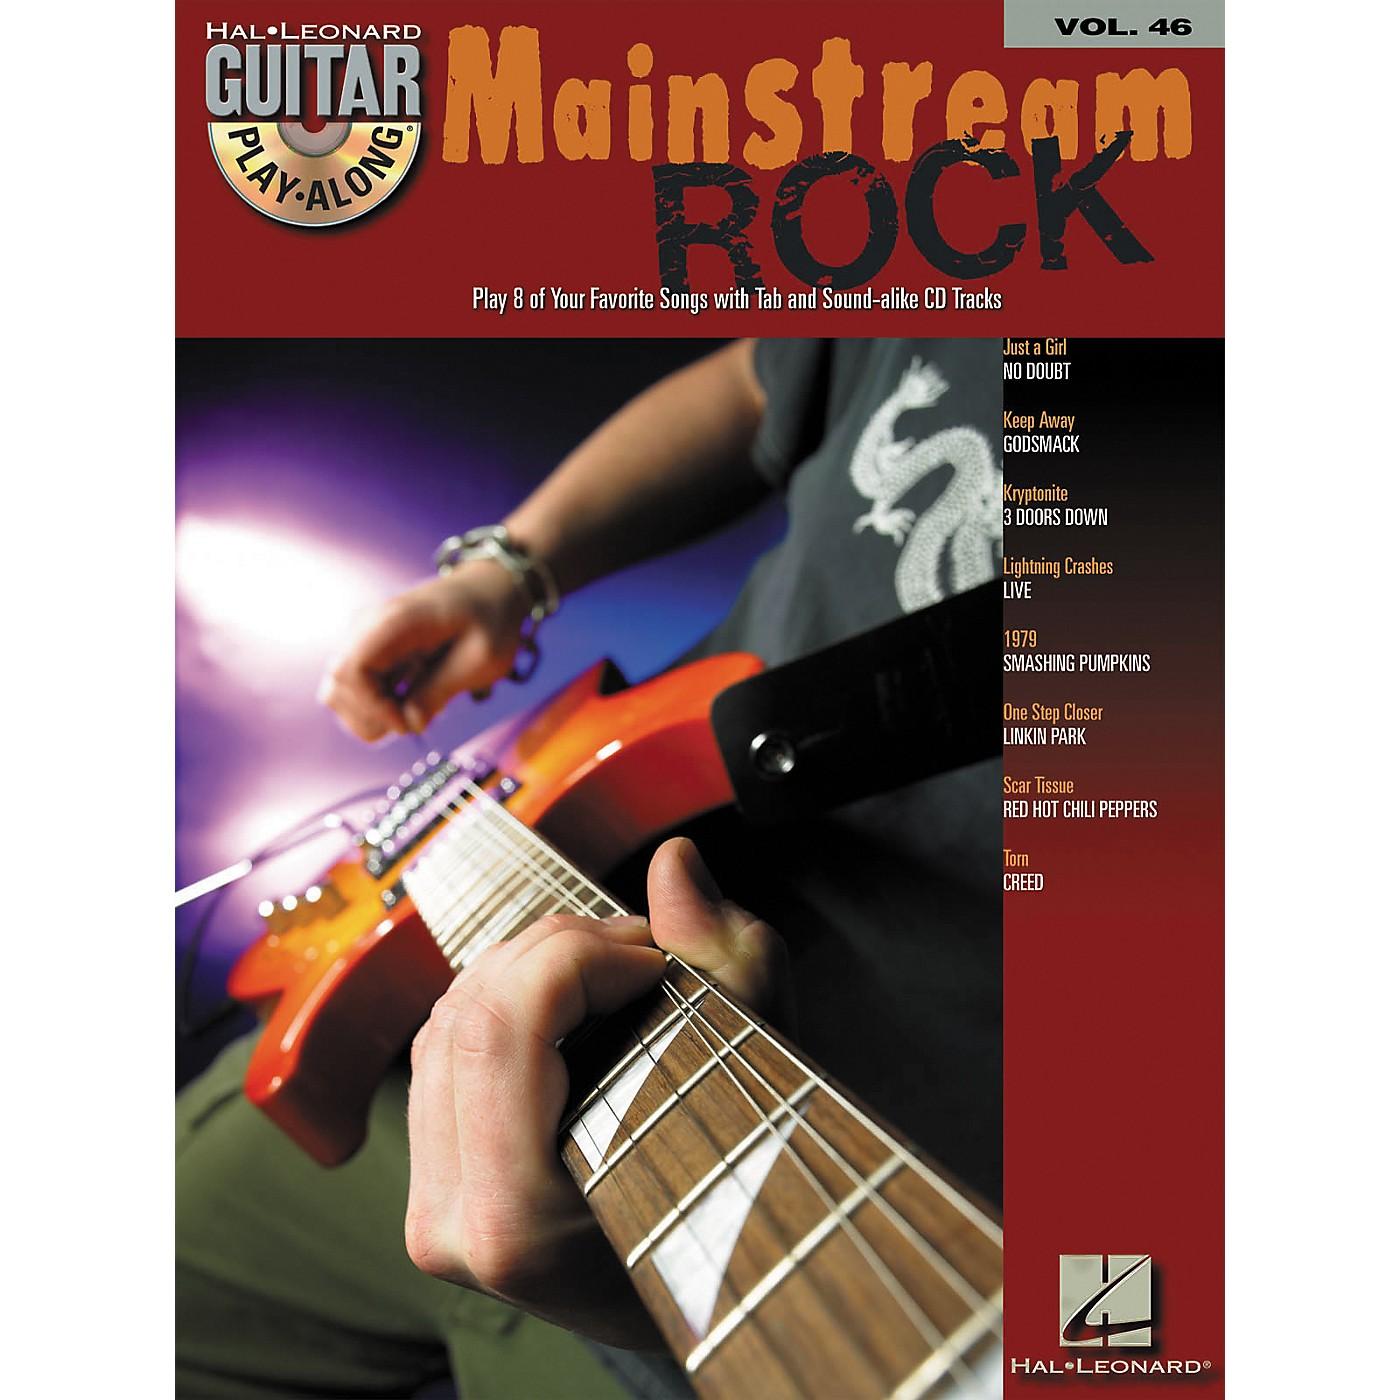 Hal Leonard Mainstream Rock Guitar Play-Along Volume 46 Book with CD thumbnail